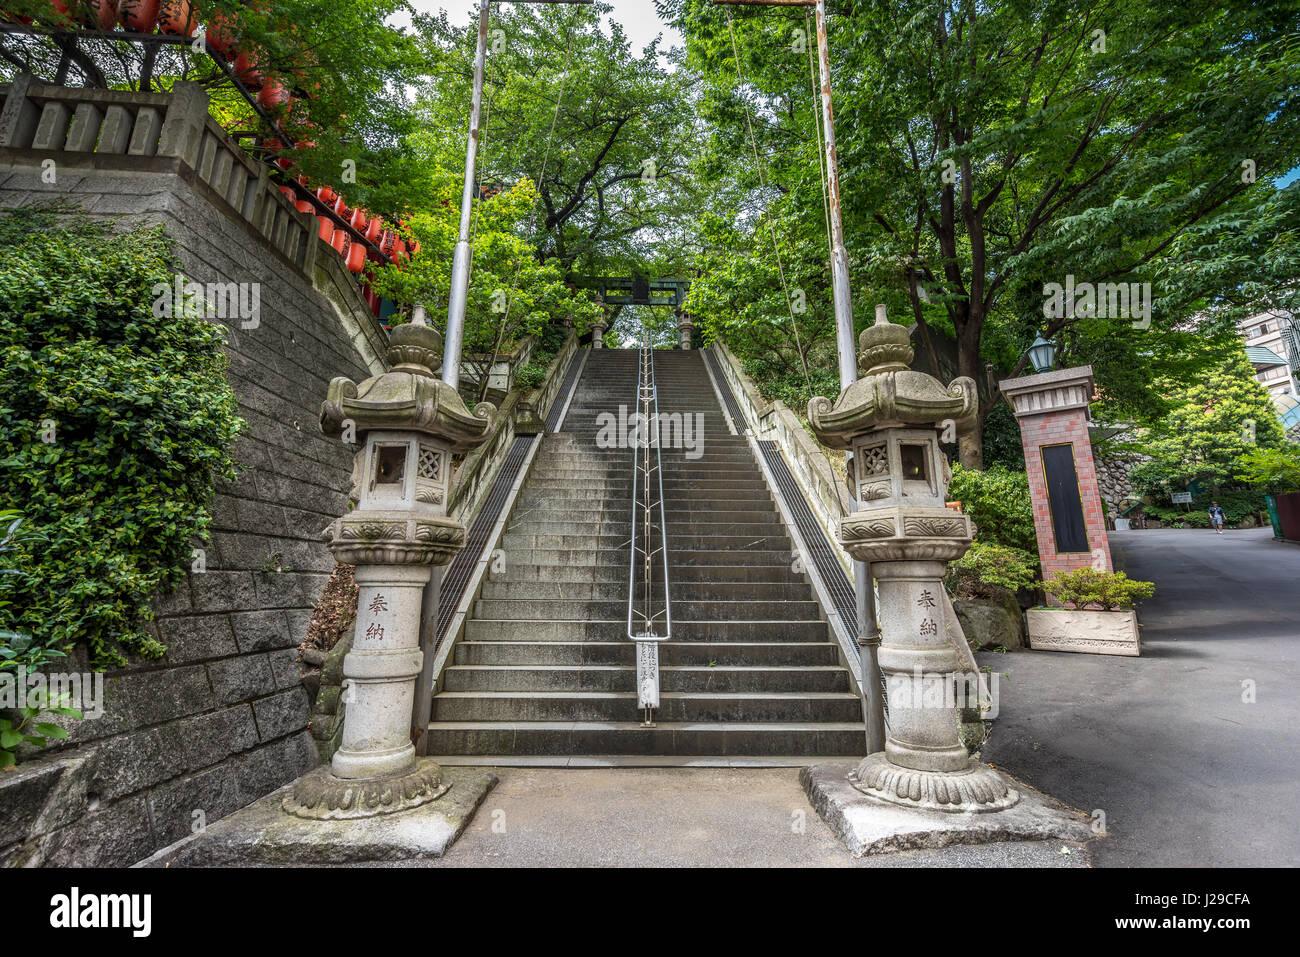 Fairytopia Entrance-stairs-to-ichigaya-kamegaoka-hachimangu-shrine-and-chanoki-J29CFA